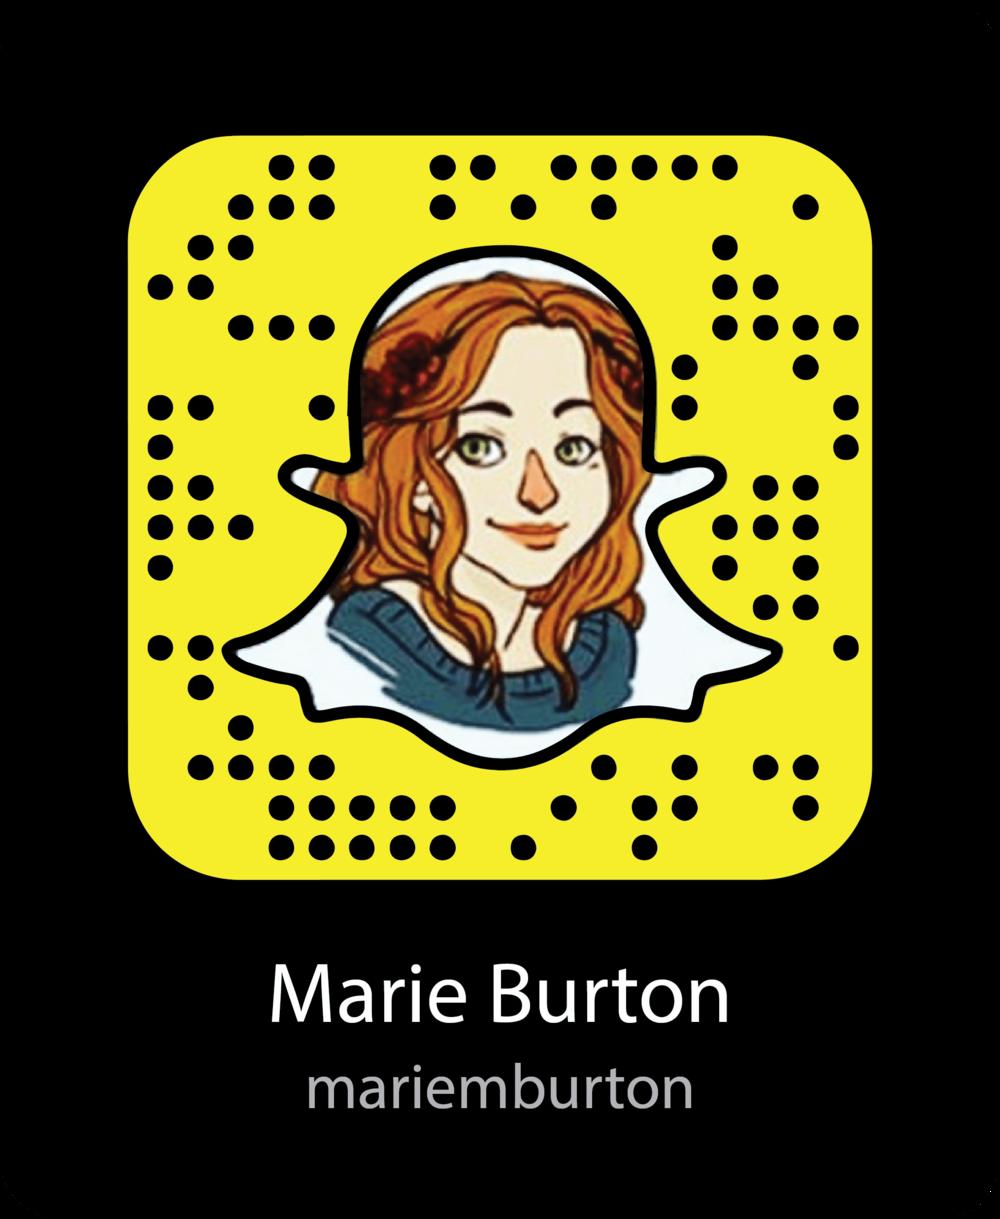 marie-burton-snapchat-snapcode